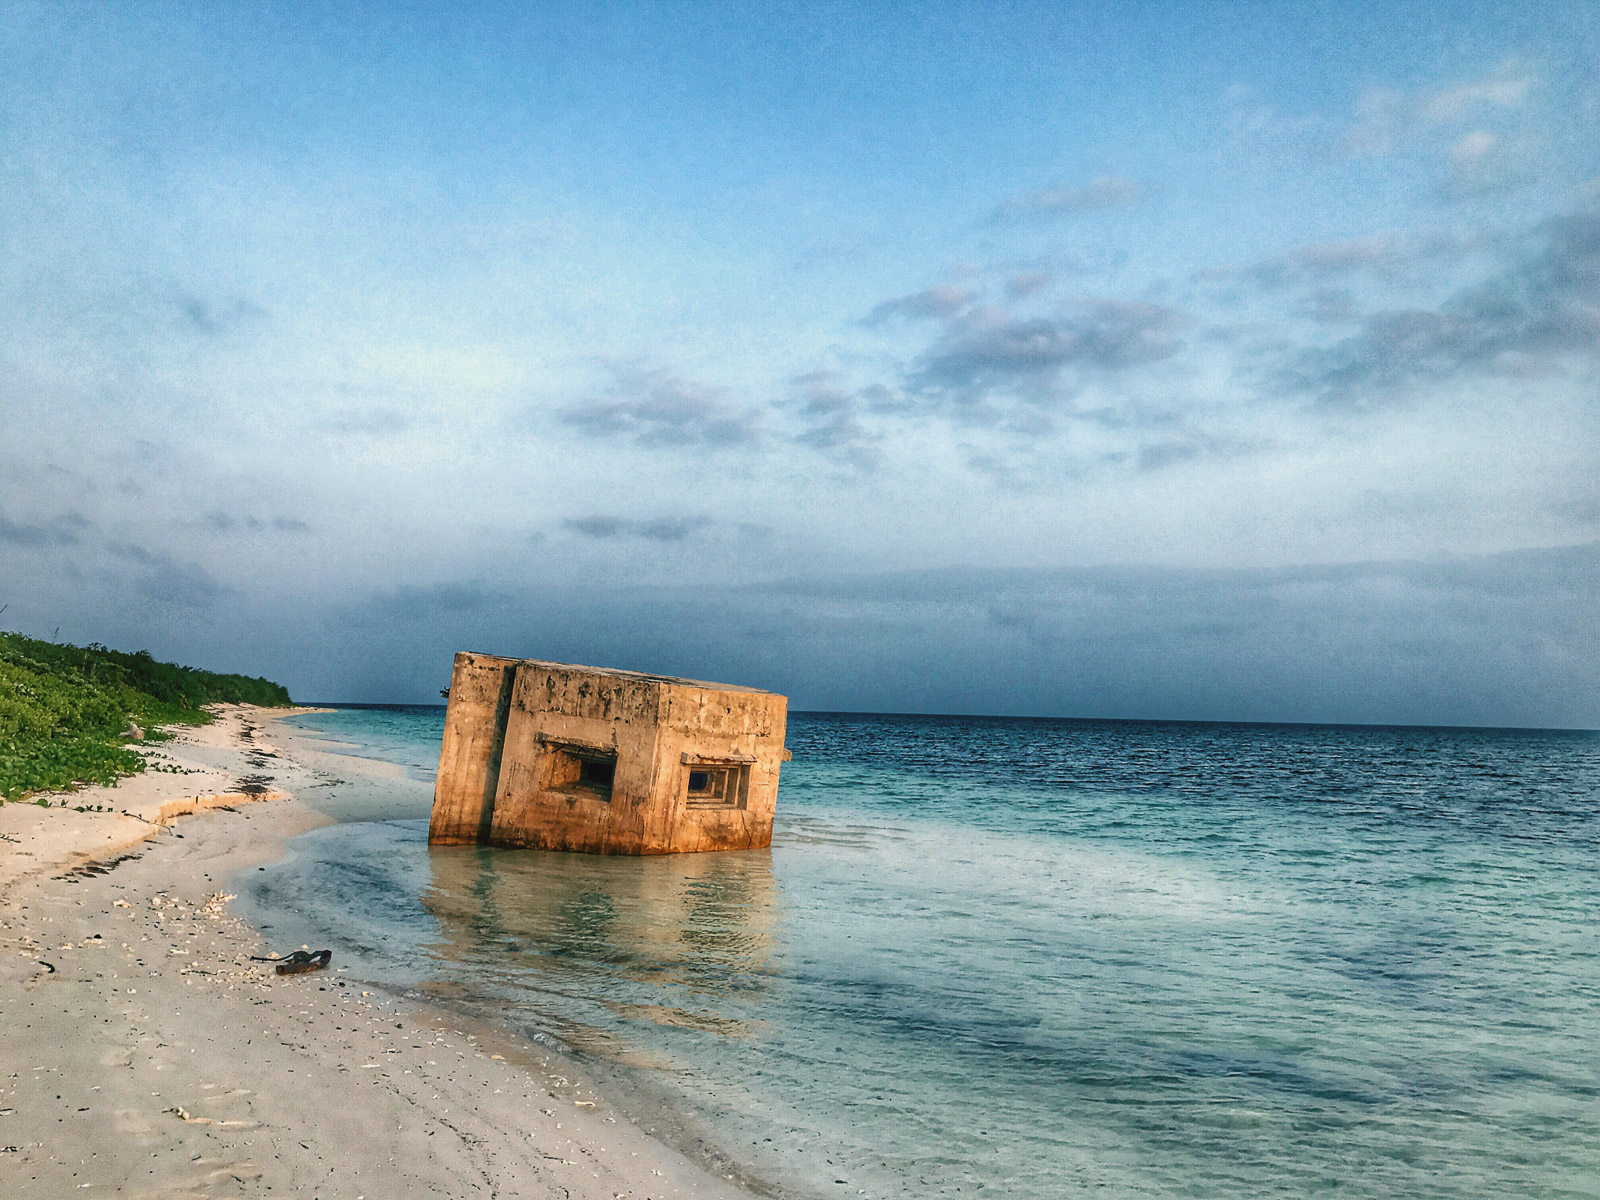 Photograph by Shashank Keshavmurthy - Beach on Dongsha Atoll